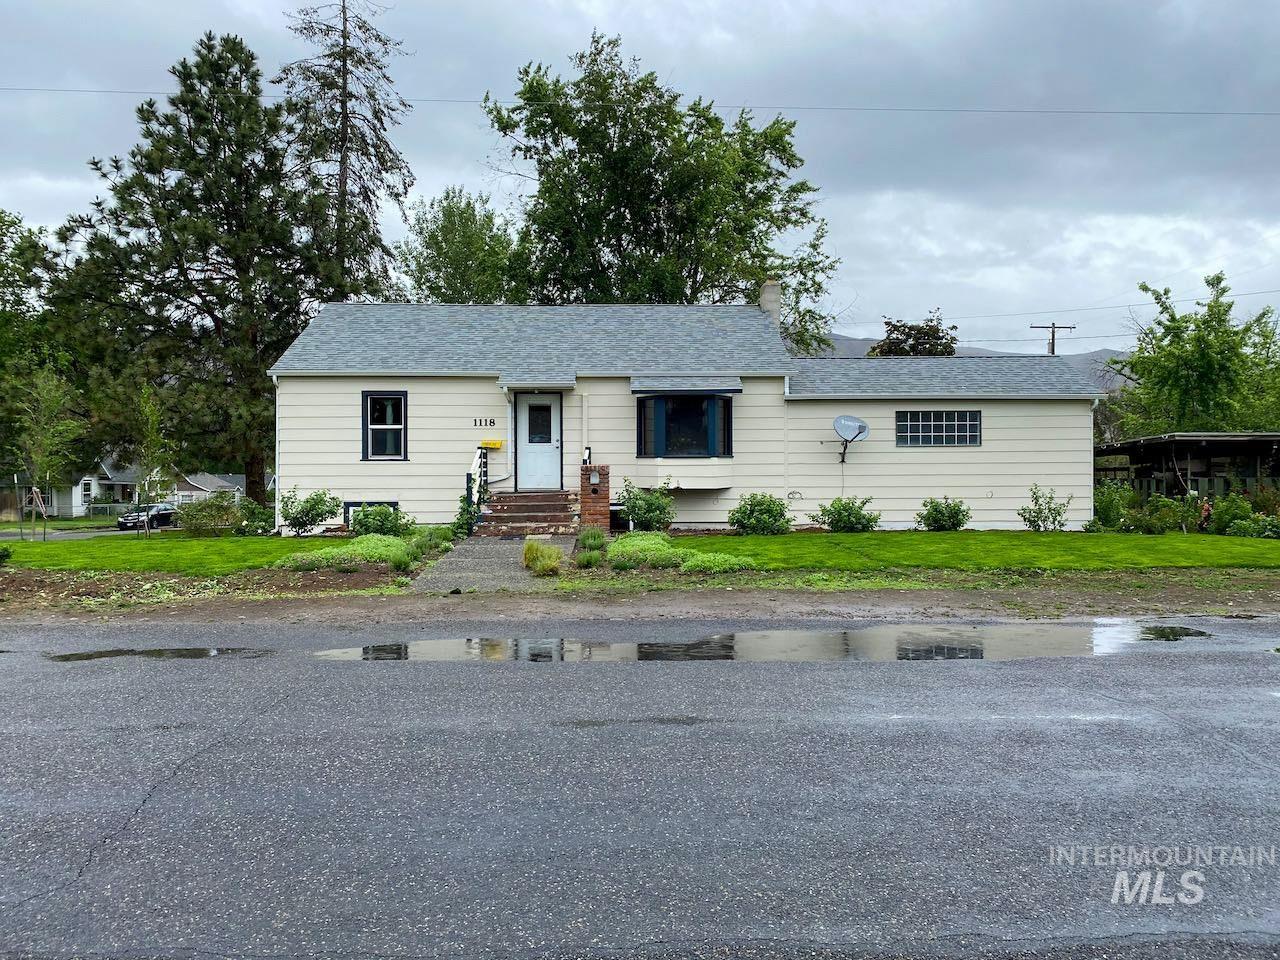 1118 Maple St, Clarkston, WA 99403 - MLS#: 98767644